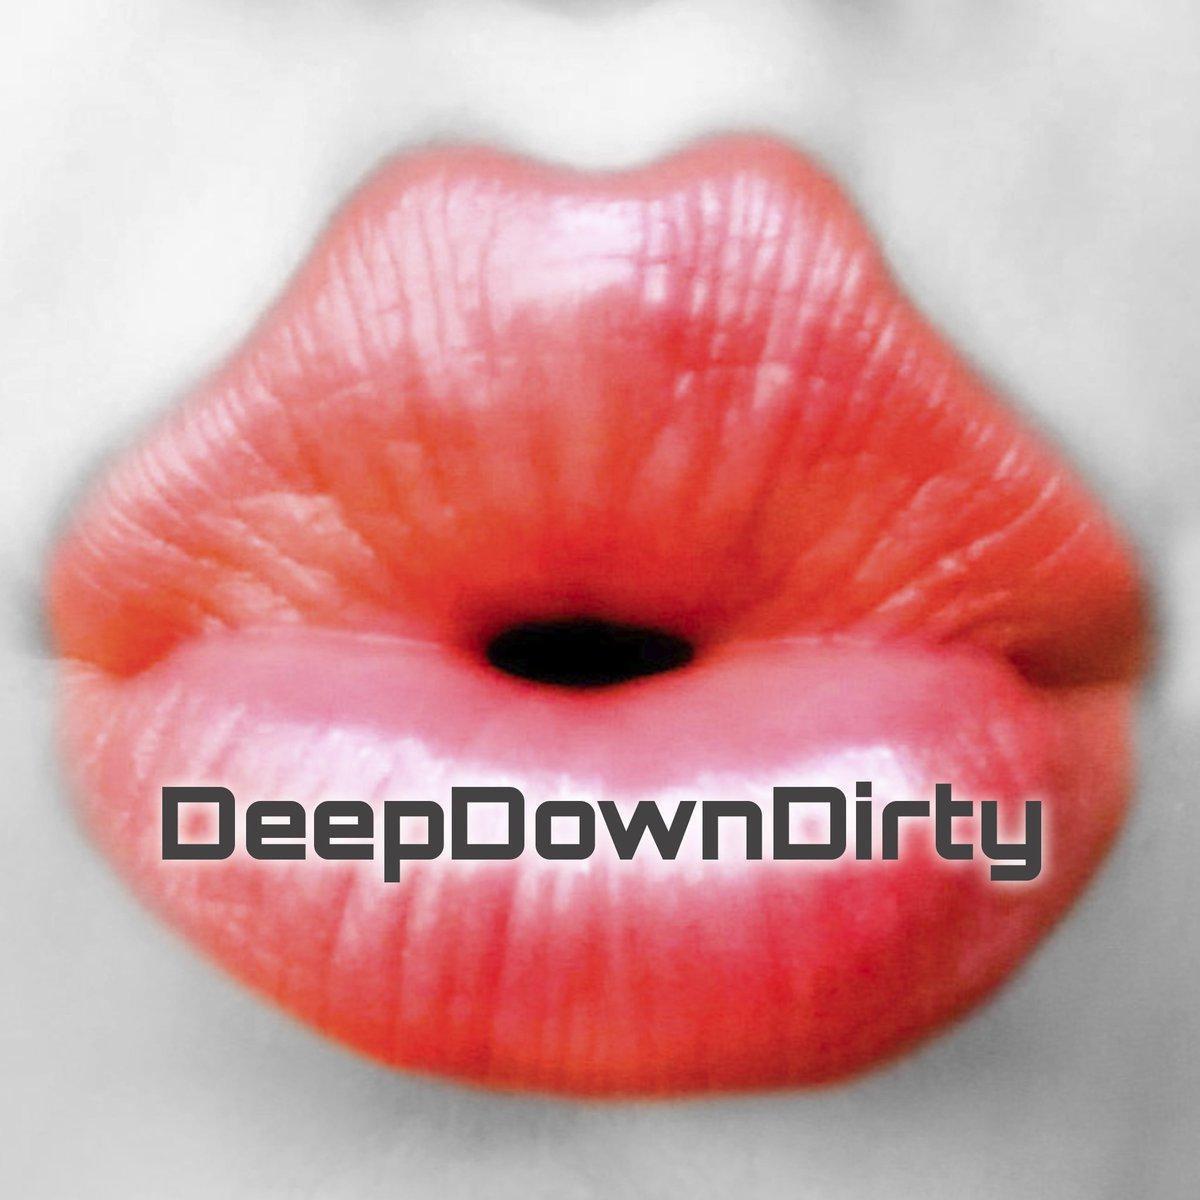 Love #TechnoMusic?  Check out @DeepDownDirtyRL&#39;s @YouTube #Playlist  http:// zurl.co/wZnW  &nbsp;   #Deep #Dark #Dub #Atmospheric #Techno <br>http://pic.twitter.com/3di6FTVUIr